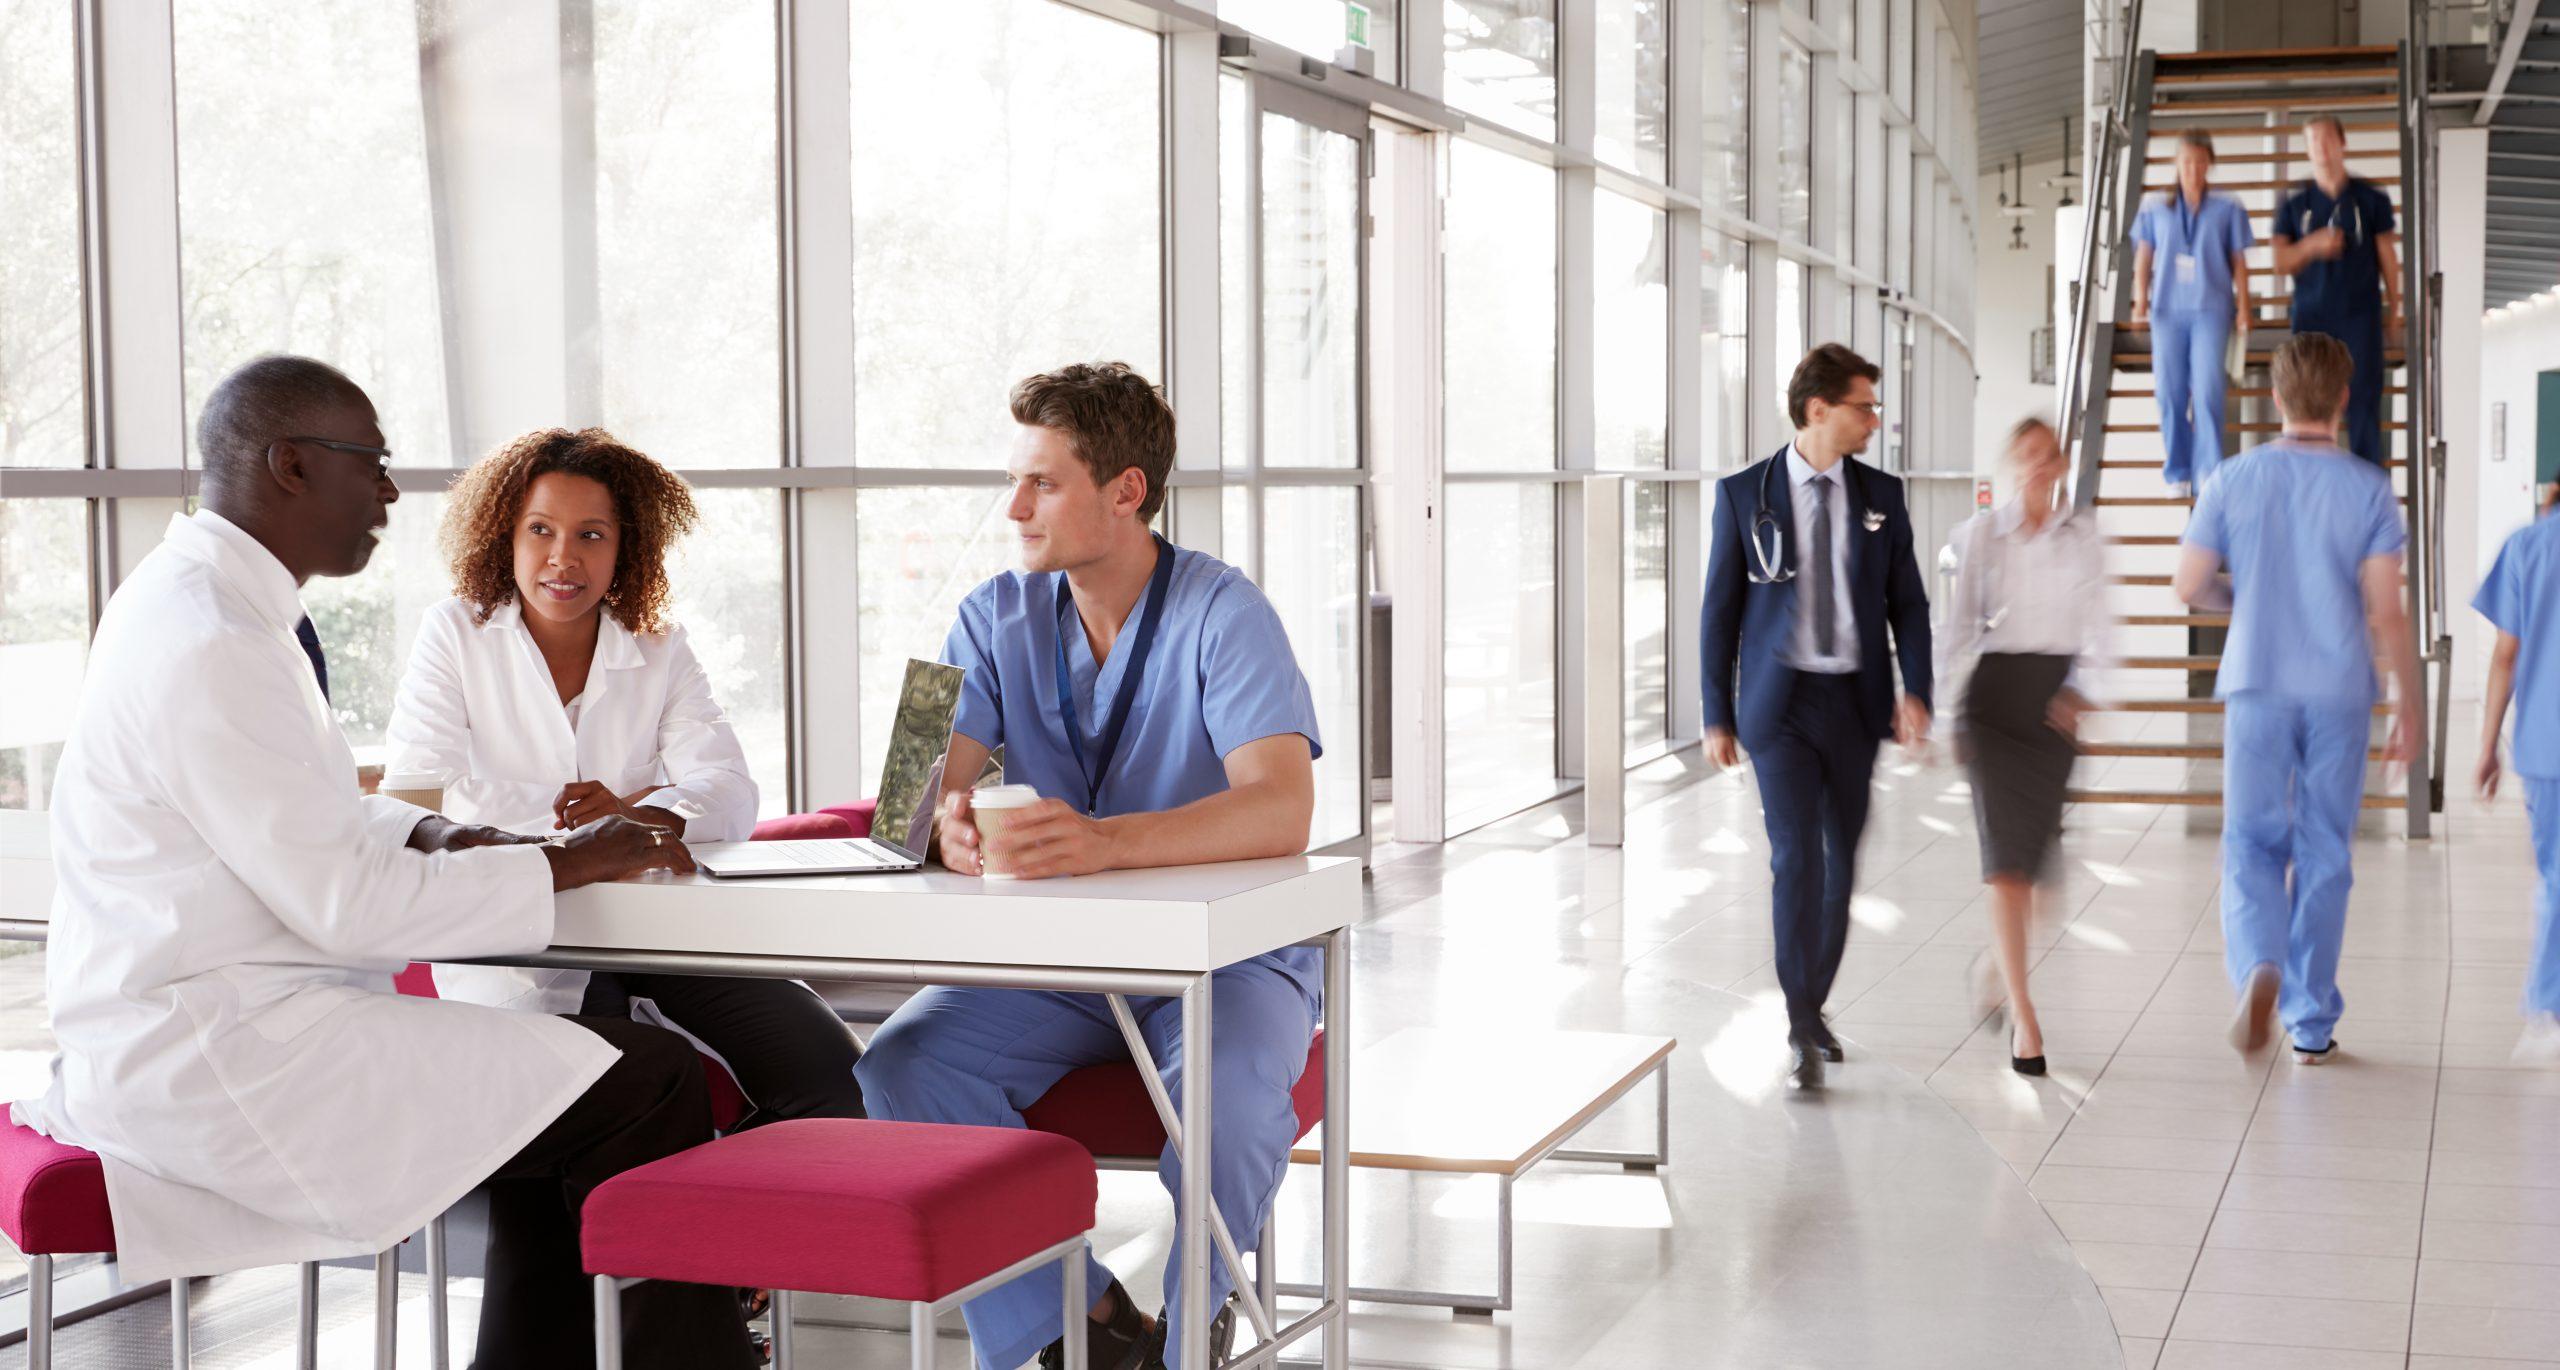 VIP StarNETWORK Health Lobby Doctors Facility Personell